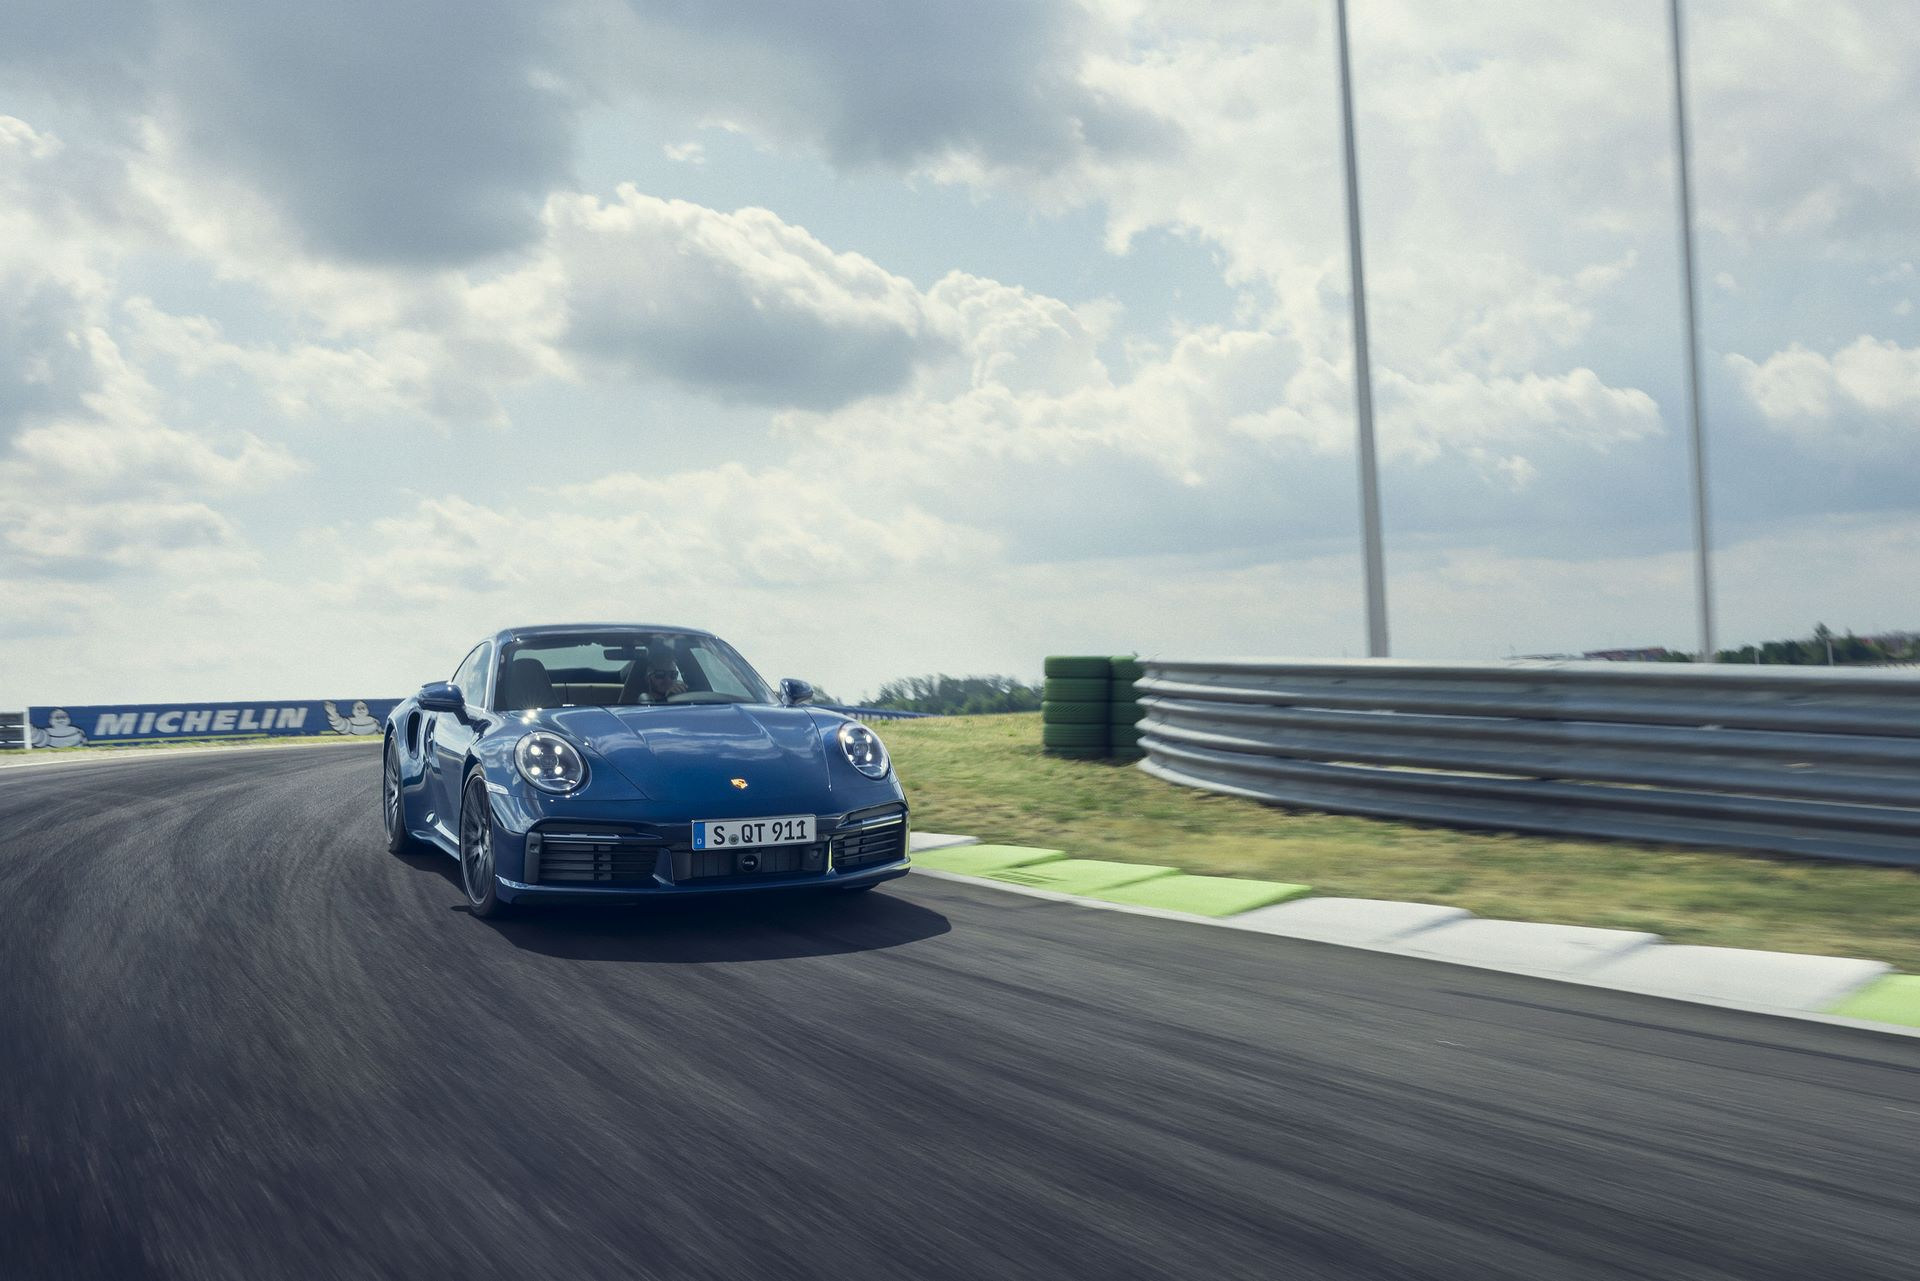 Porsche-911-Turbo-2020-13